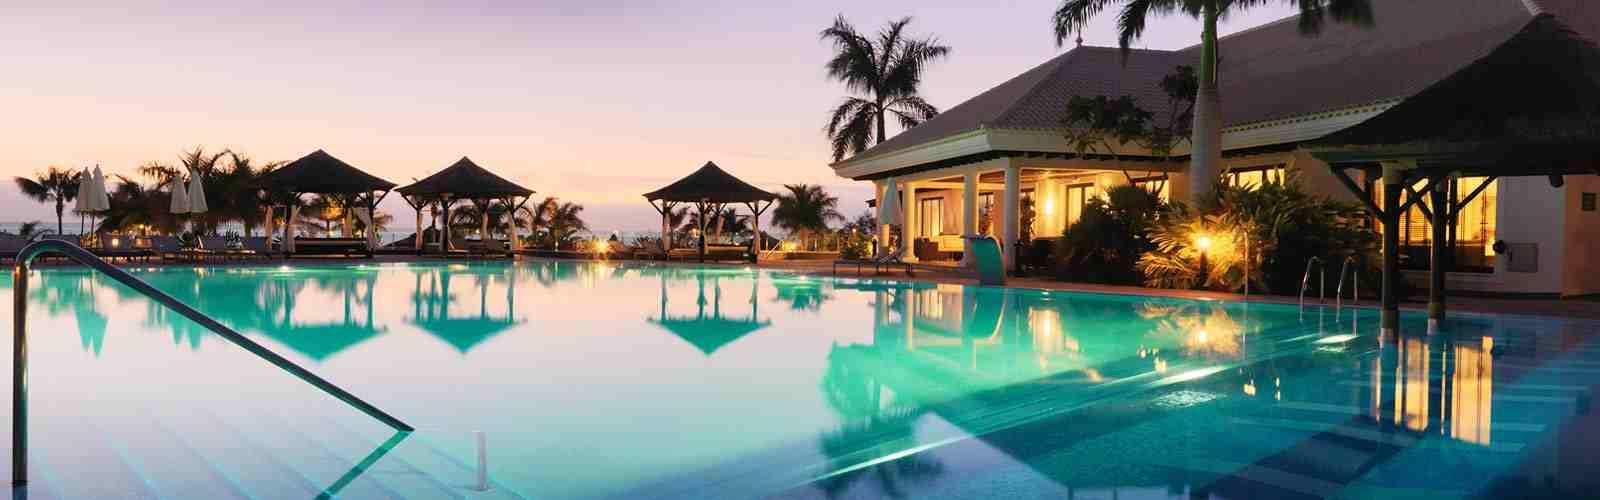 Gran melia palacio de isora tenerife infinity pools for Melia hotel tenerife